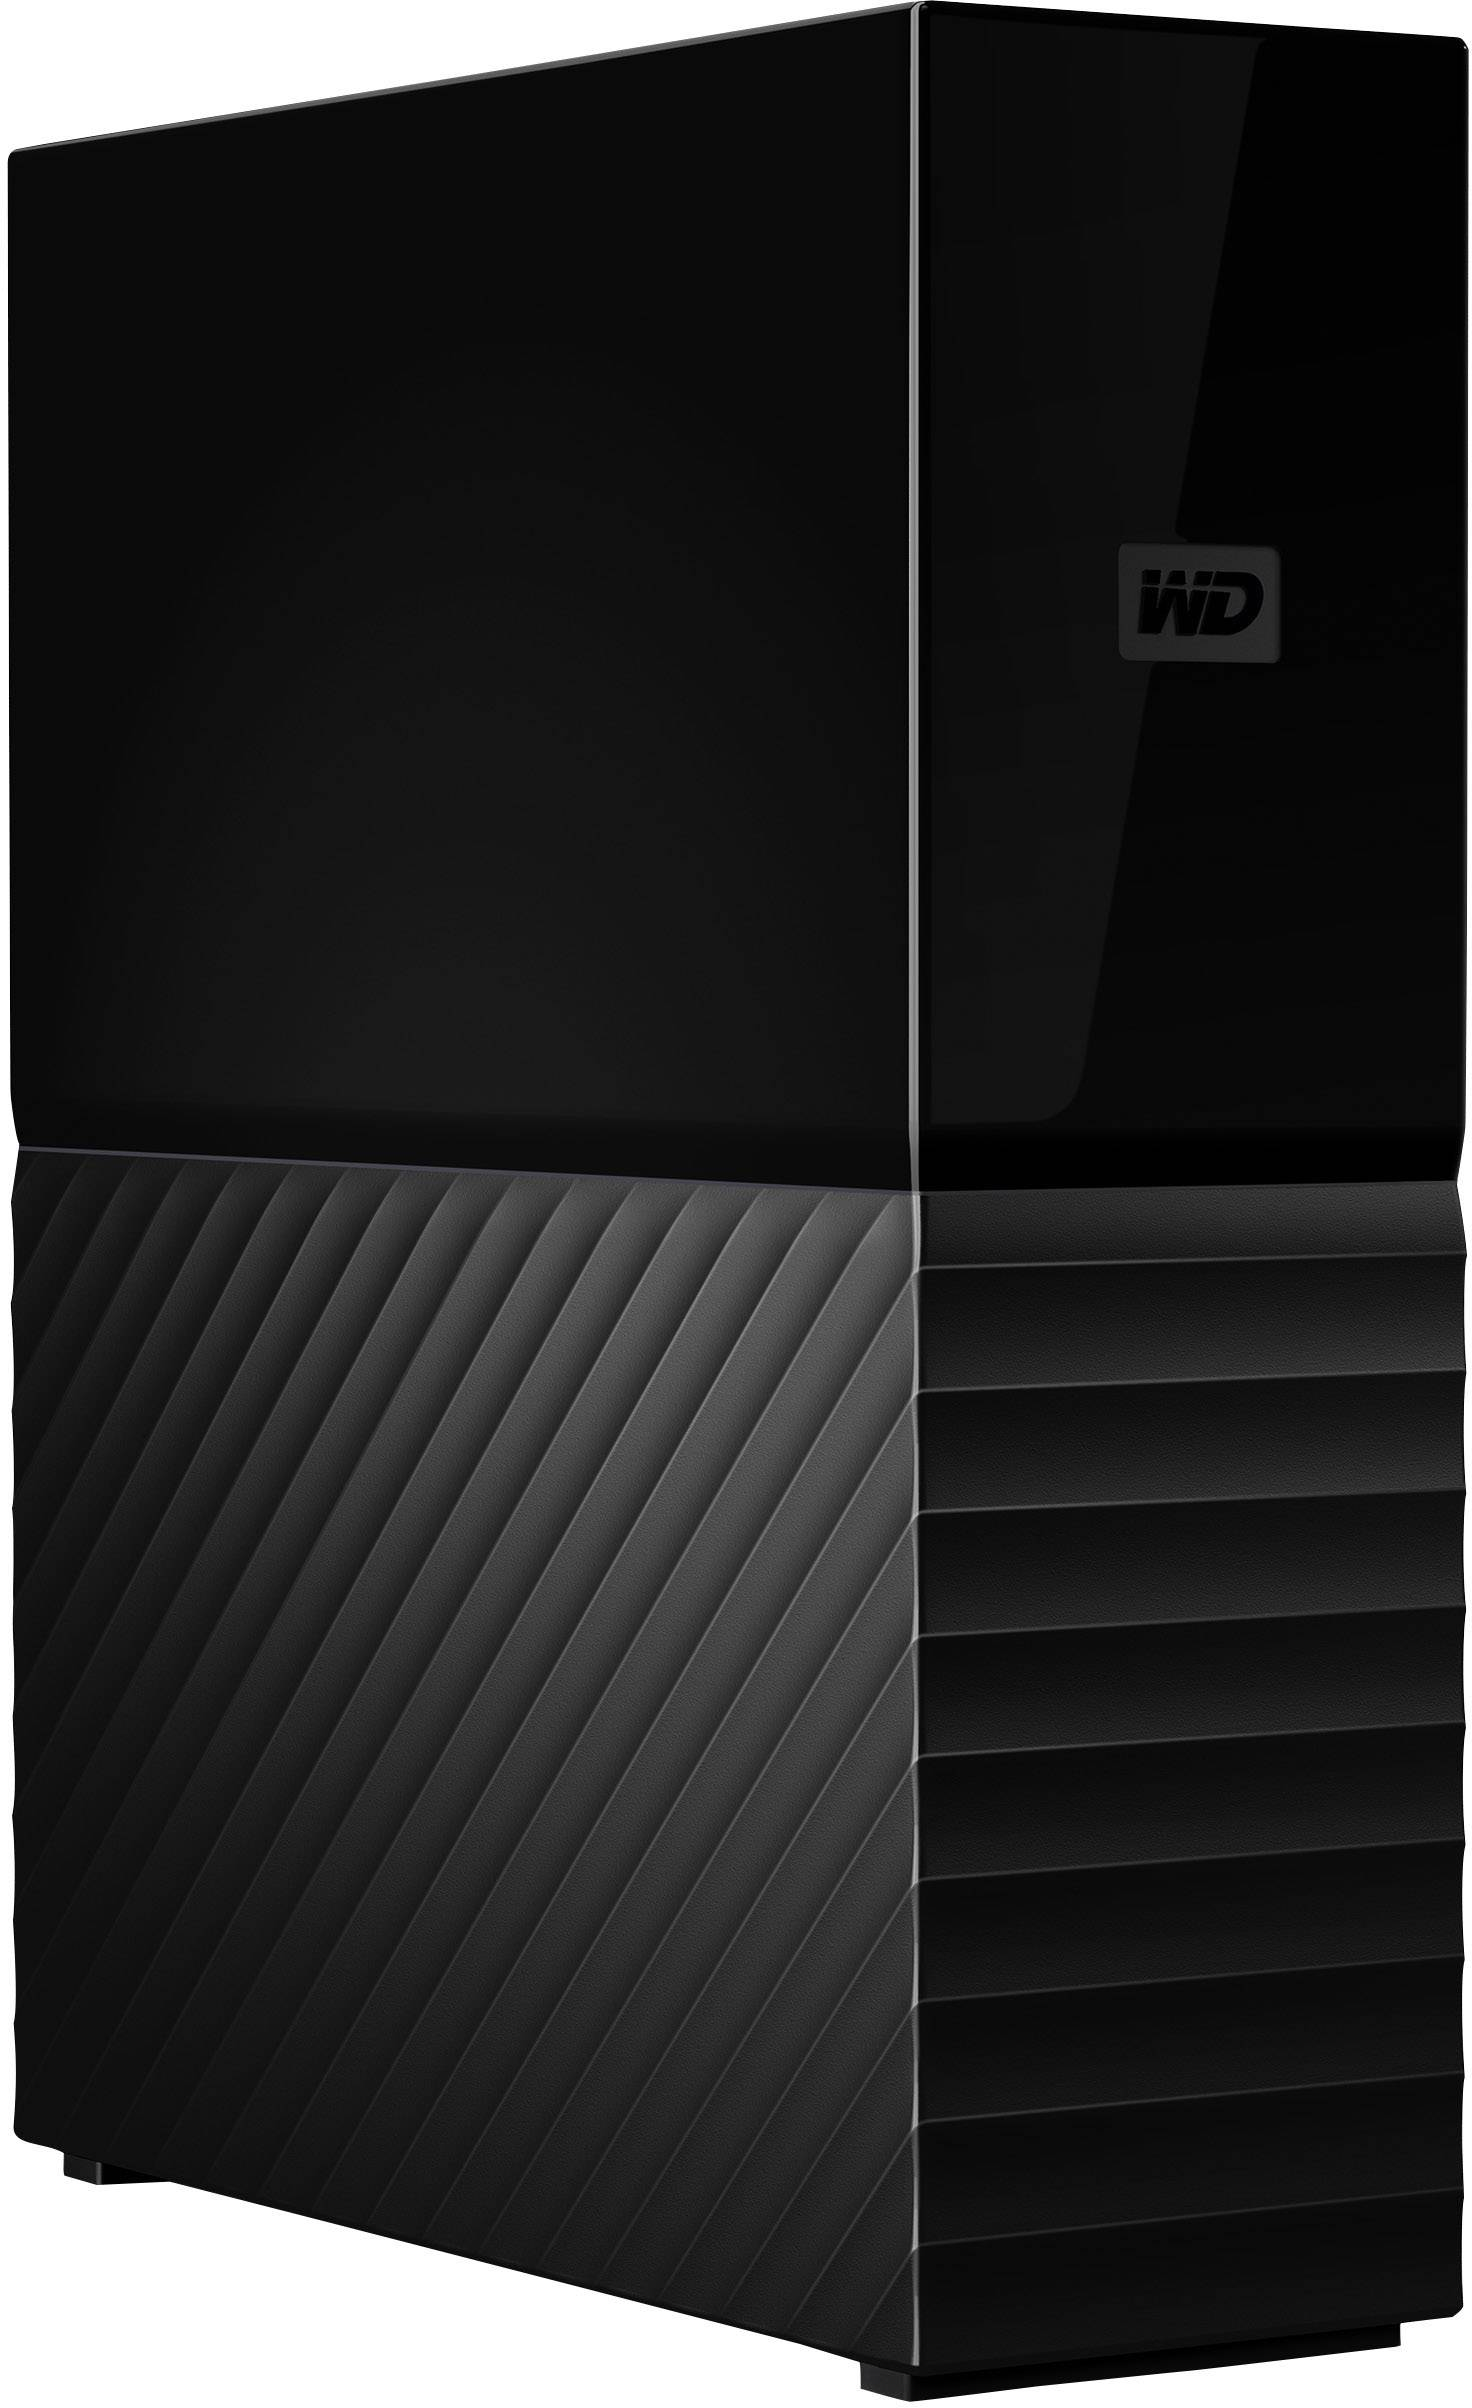 "Externí HDD 8,9 cm (3,5"") Western Digital My Book™, 6 TB, USB 3.0, černá"